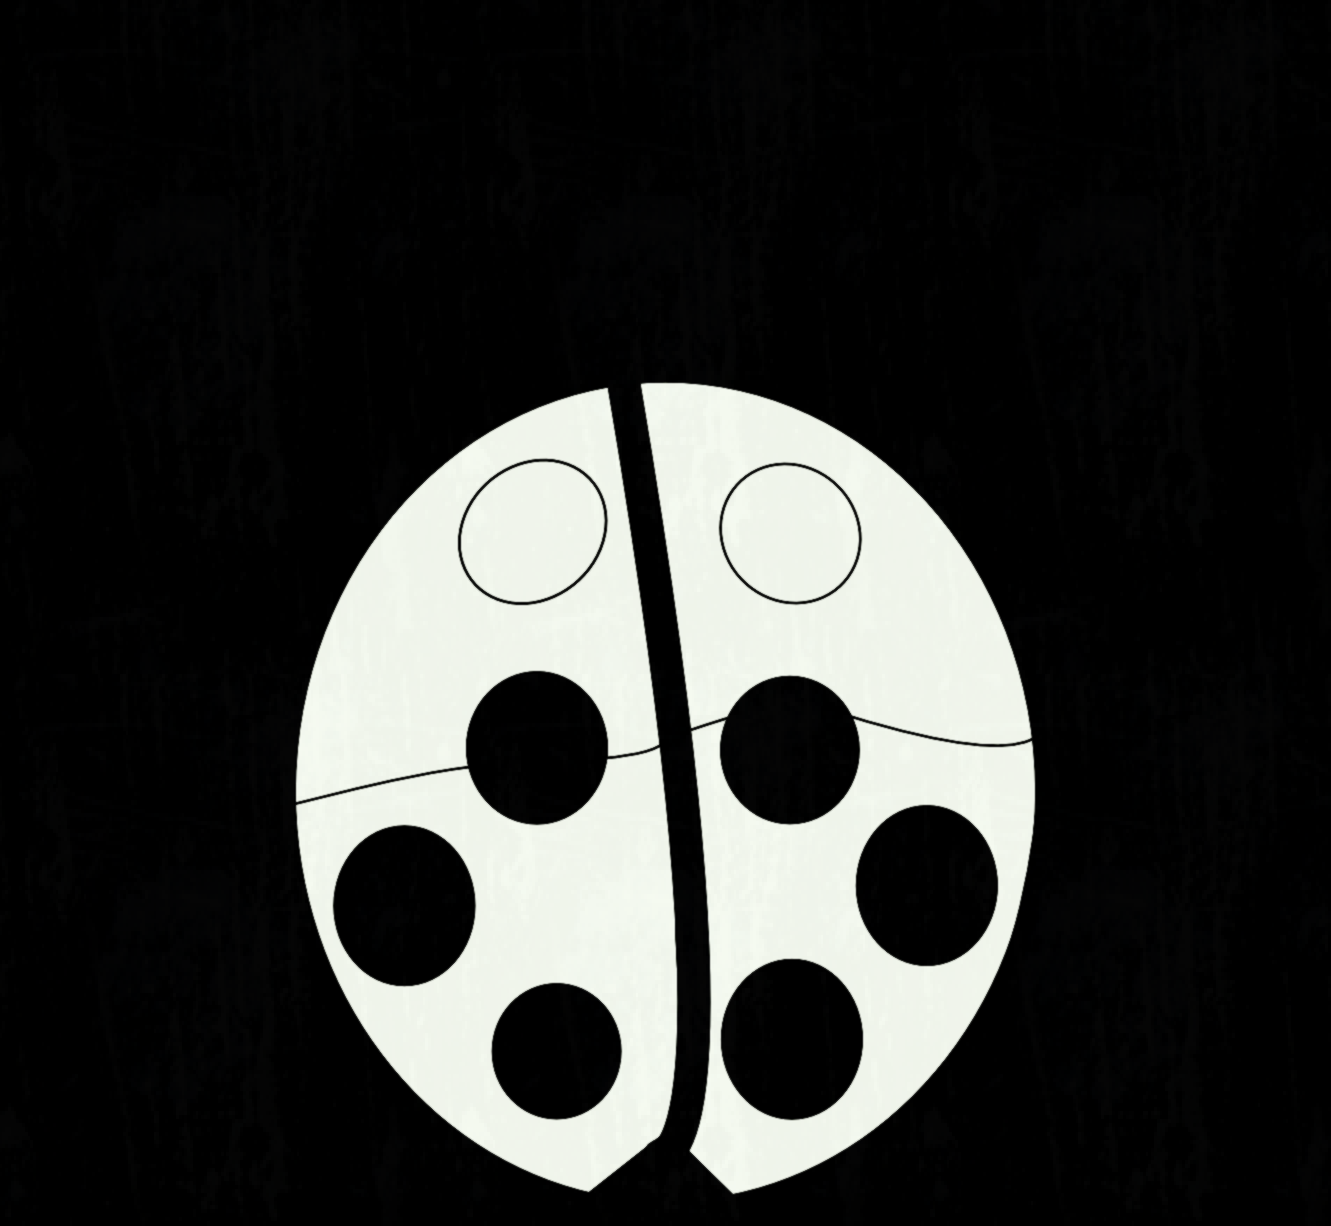 1331x1226 Ladybug Black White Line Art Flower Scalable Vector Graphics Free